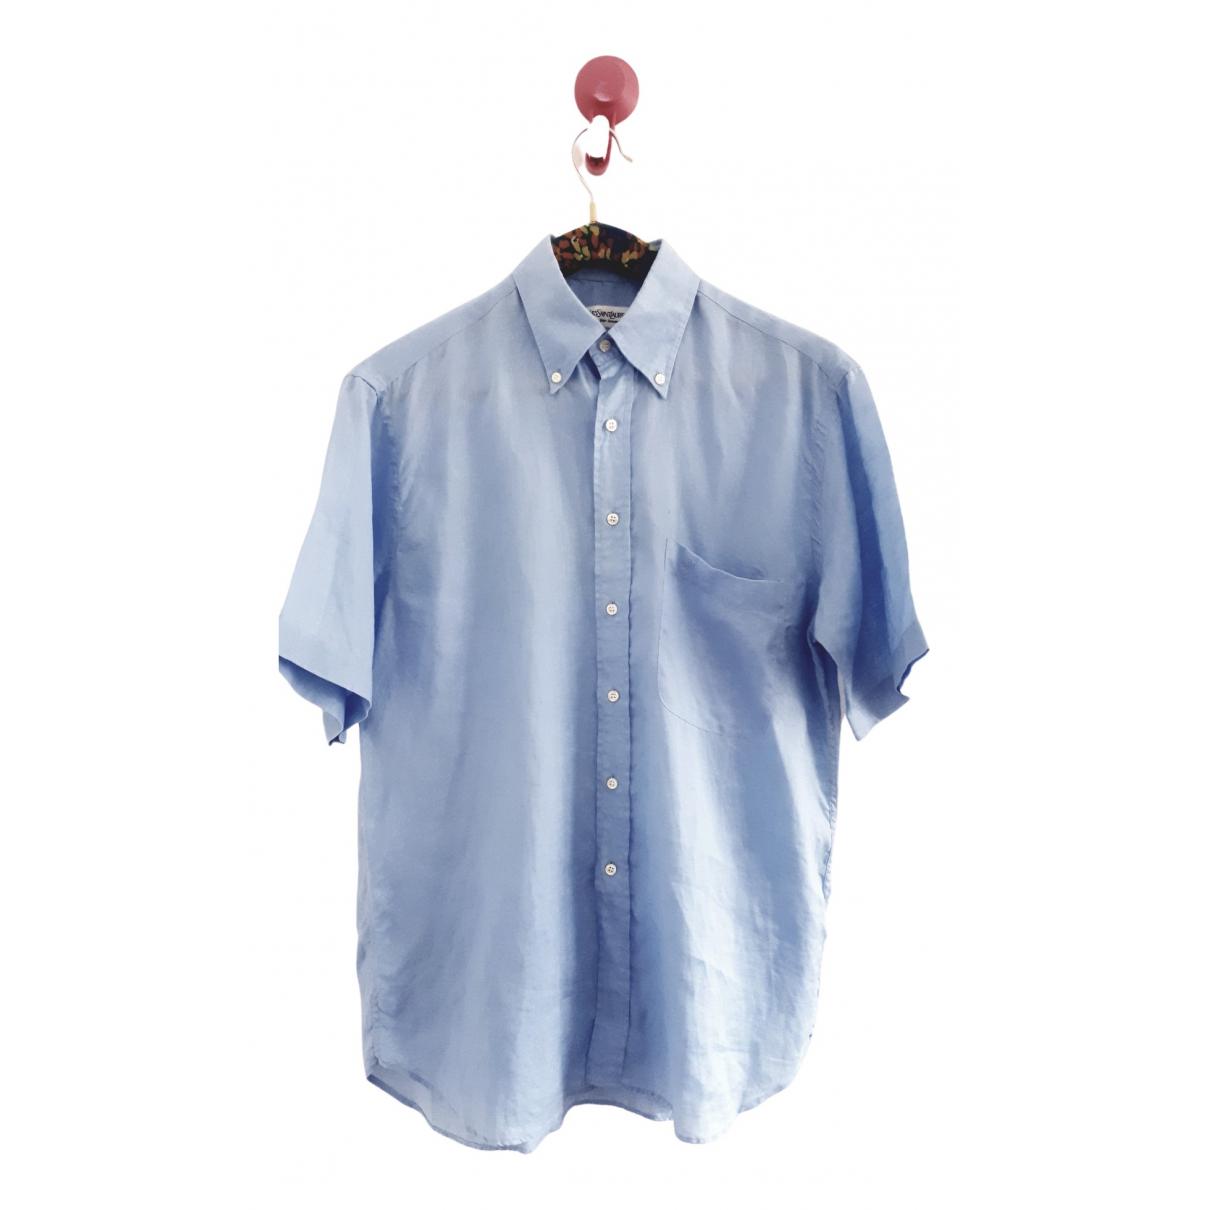 Camisas de Lino Yves Saint Laurent